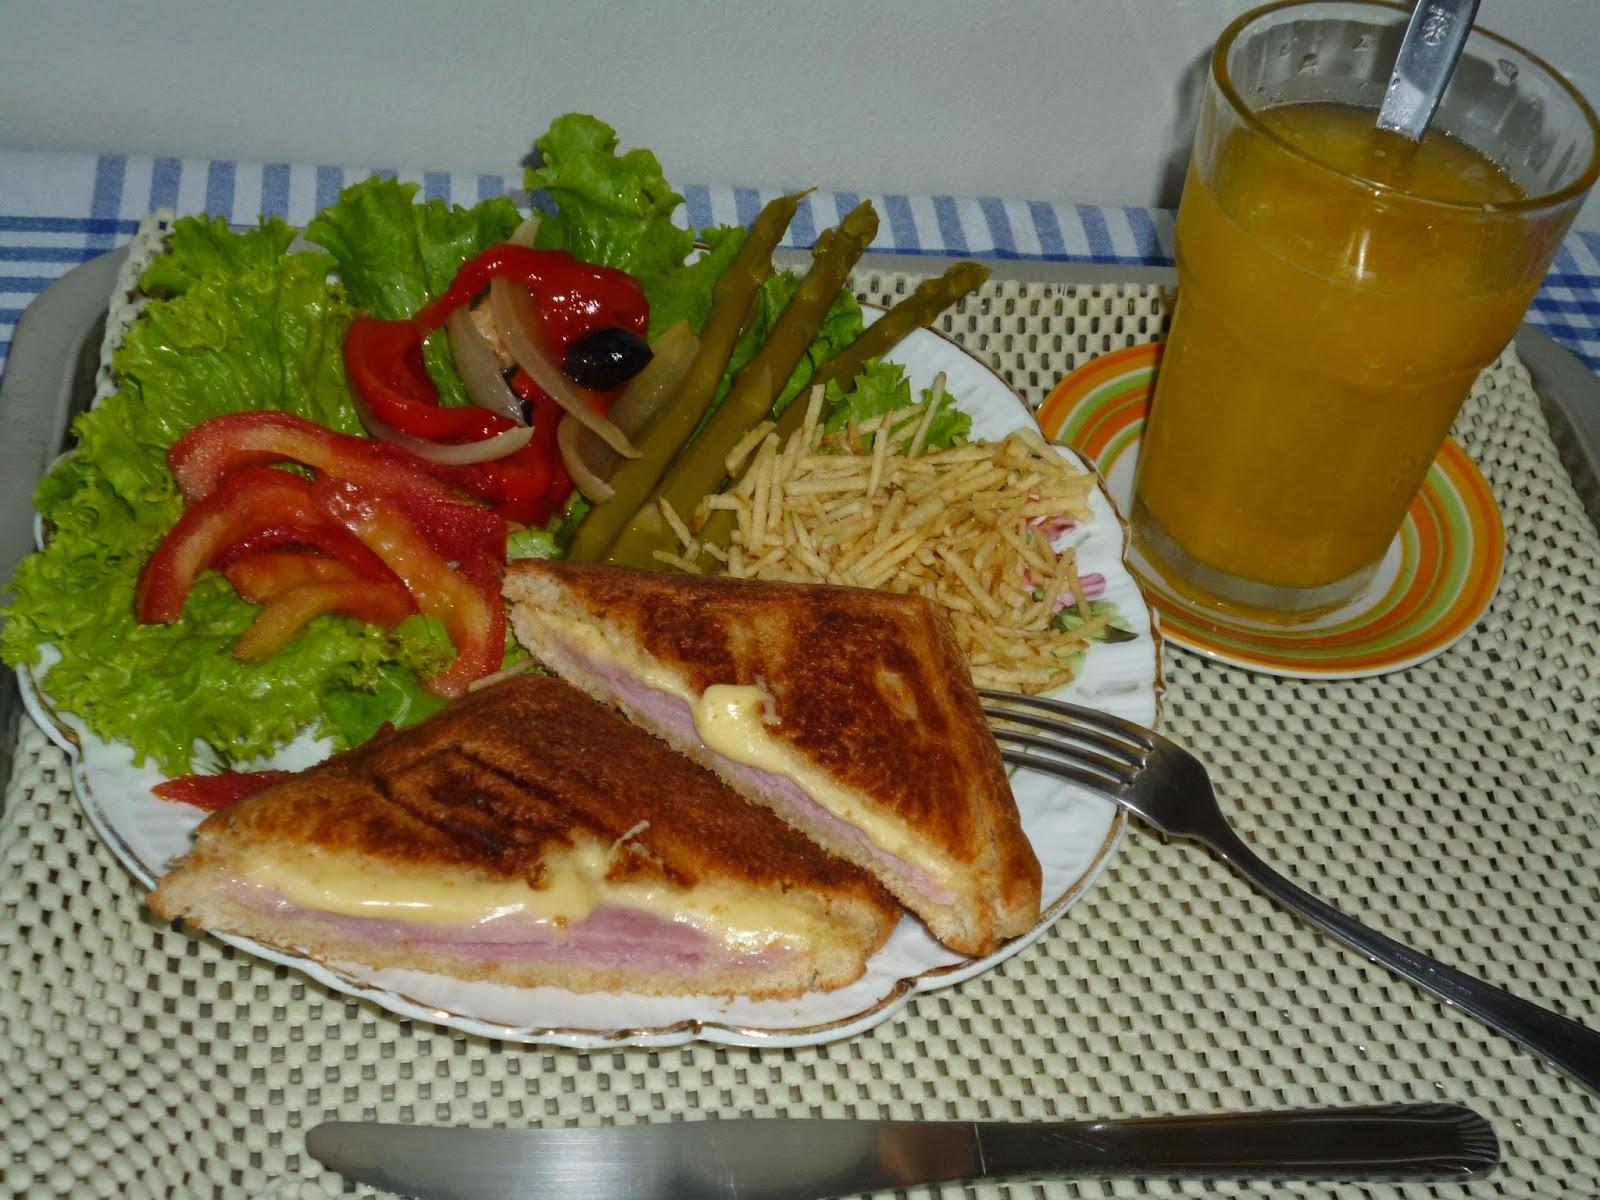 receita de lanche na sanduicheira